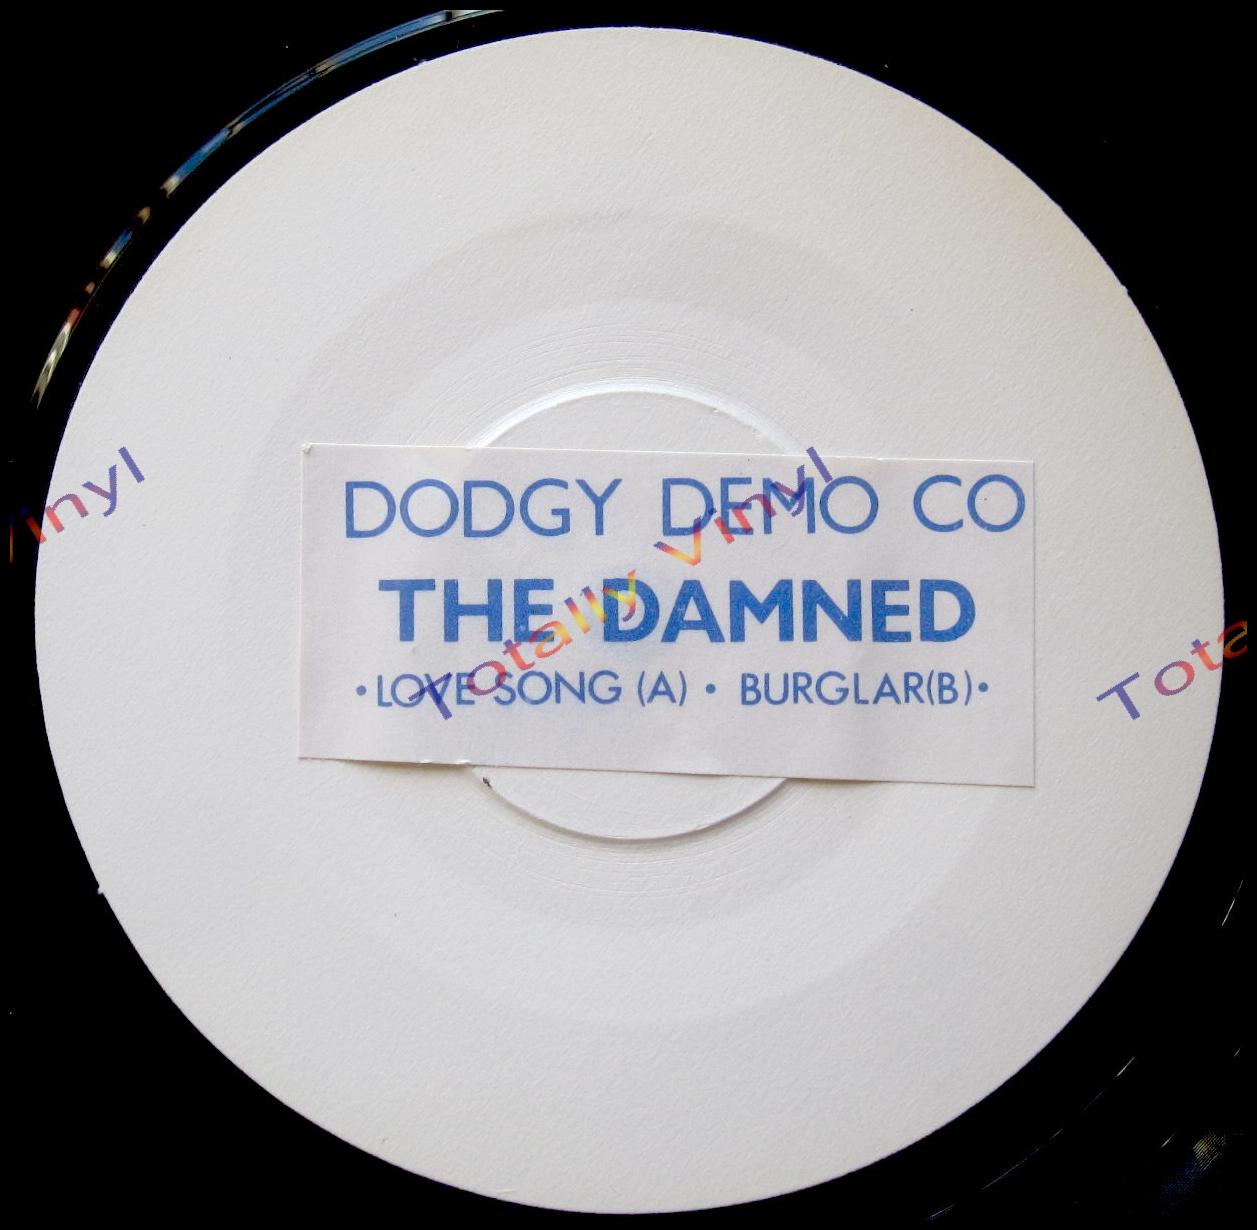 Damned Dodgy Demo